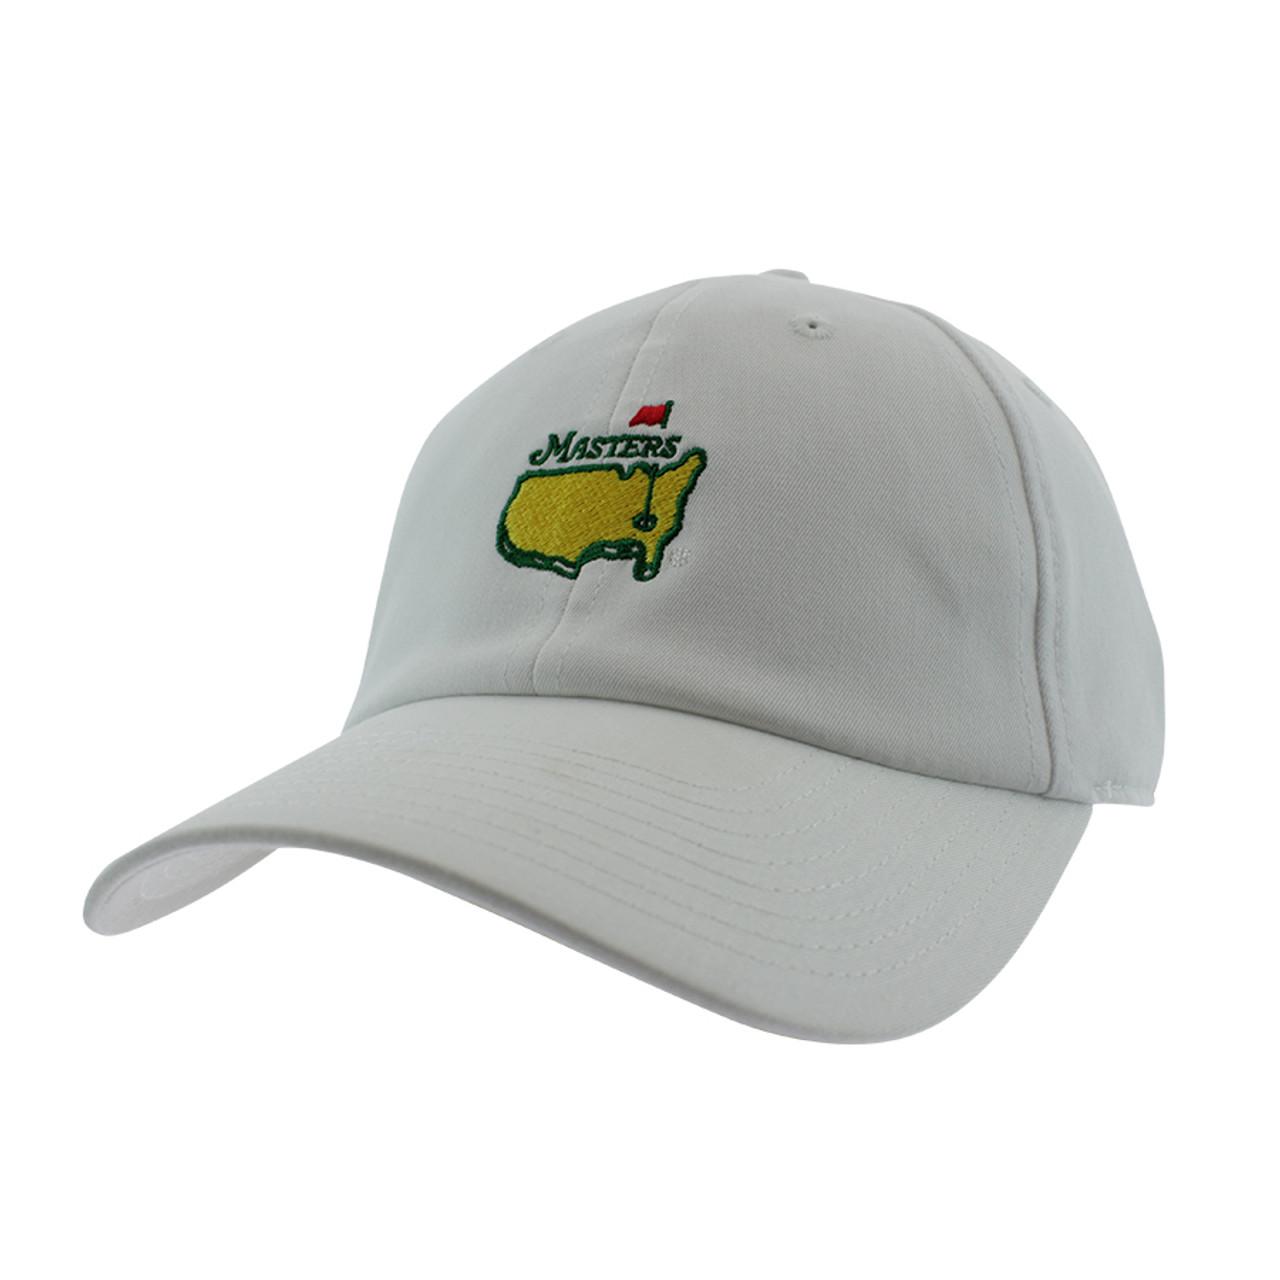 e3a27950 Masters New Hybrid Tech Caddy Hat- White